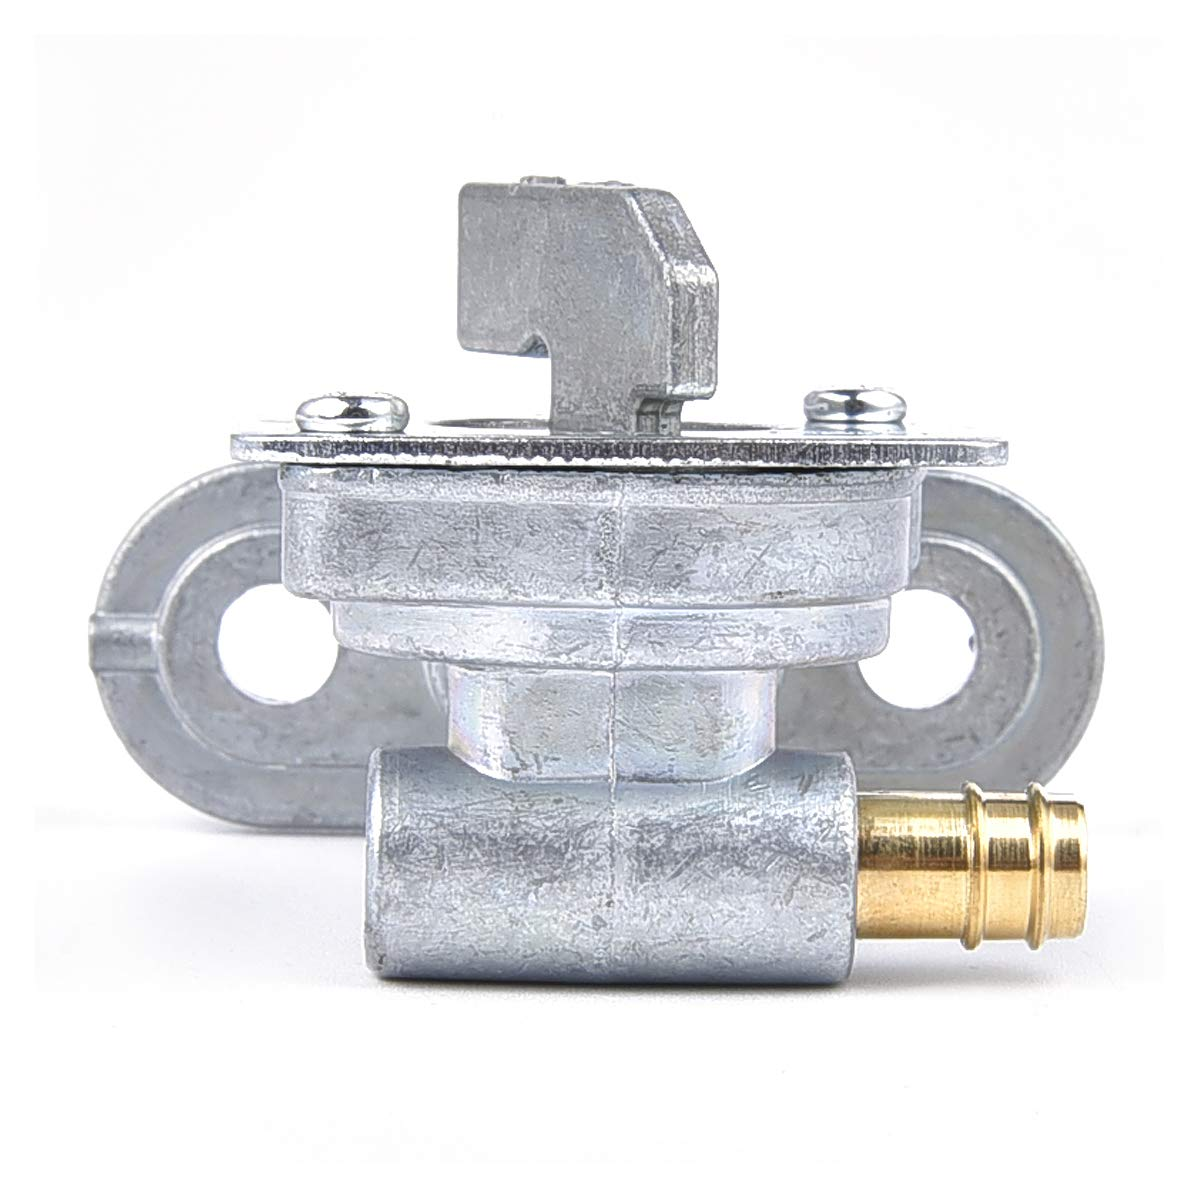 V/álvula de apagador de tanque de gas para DR650SE DR 650